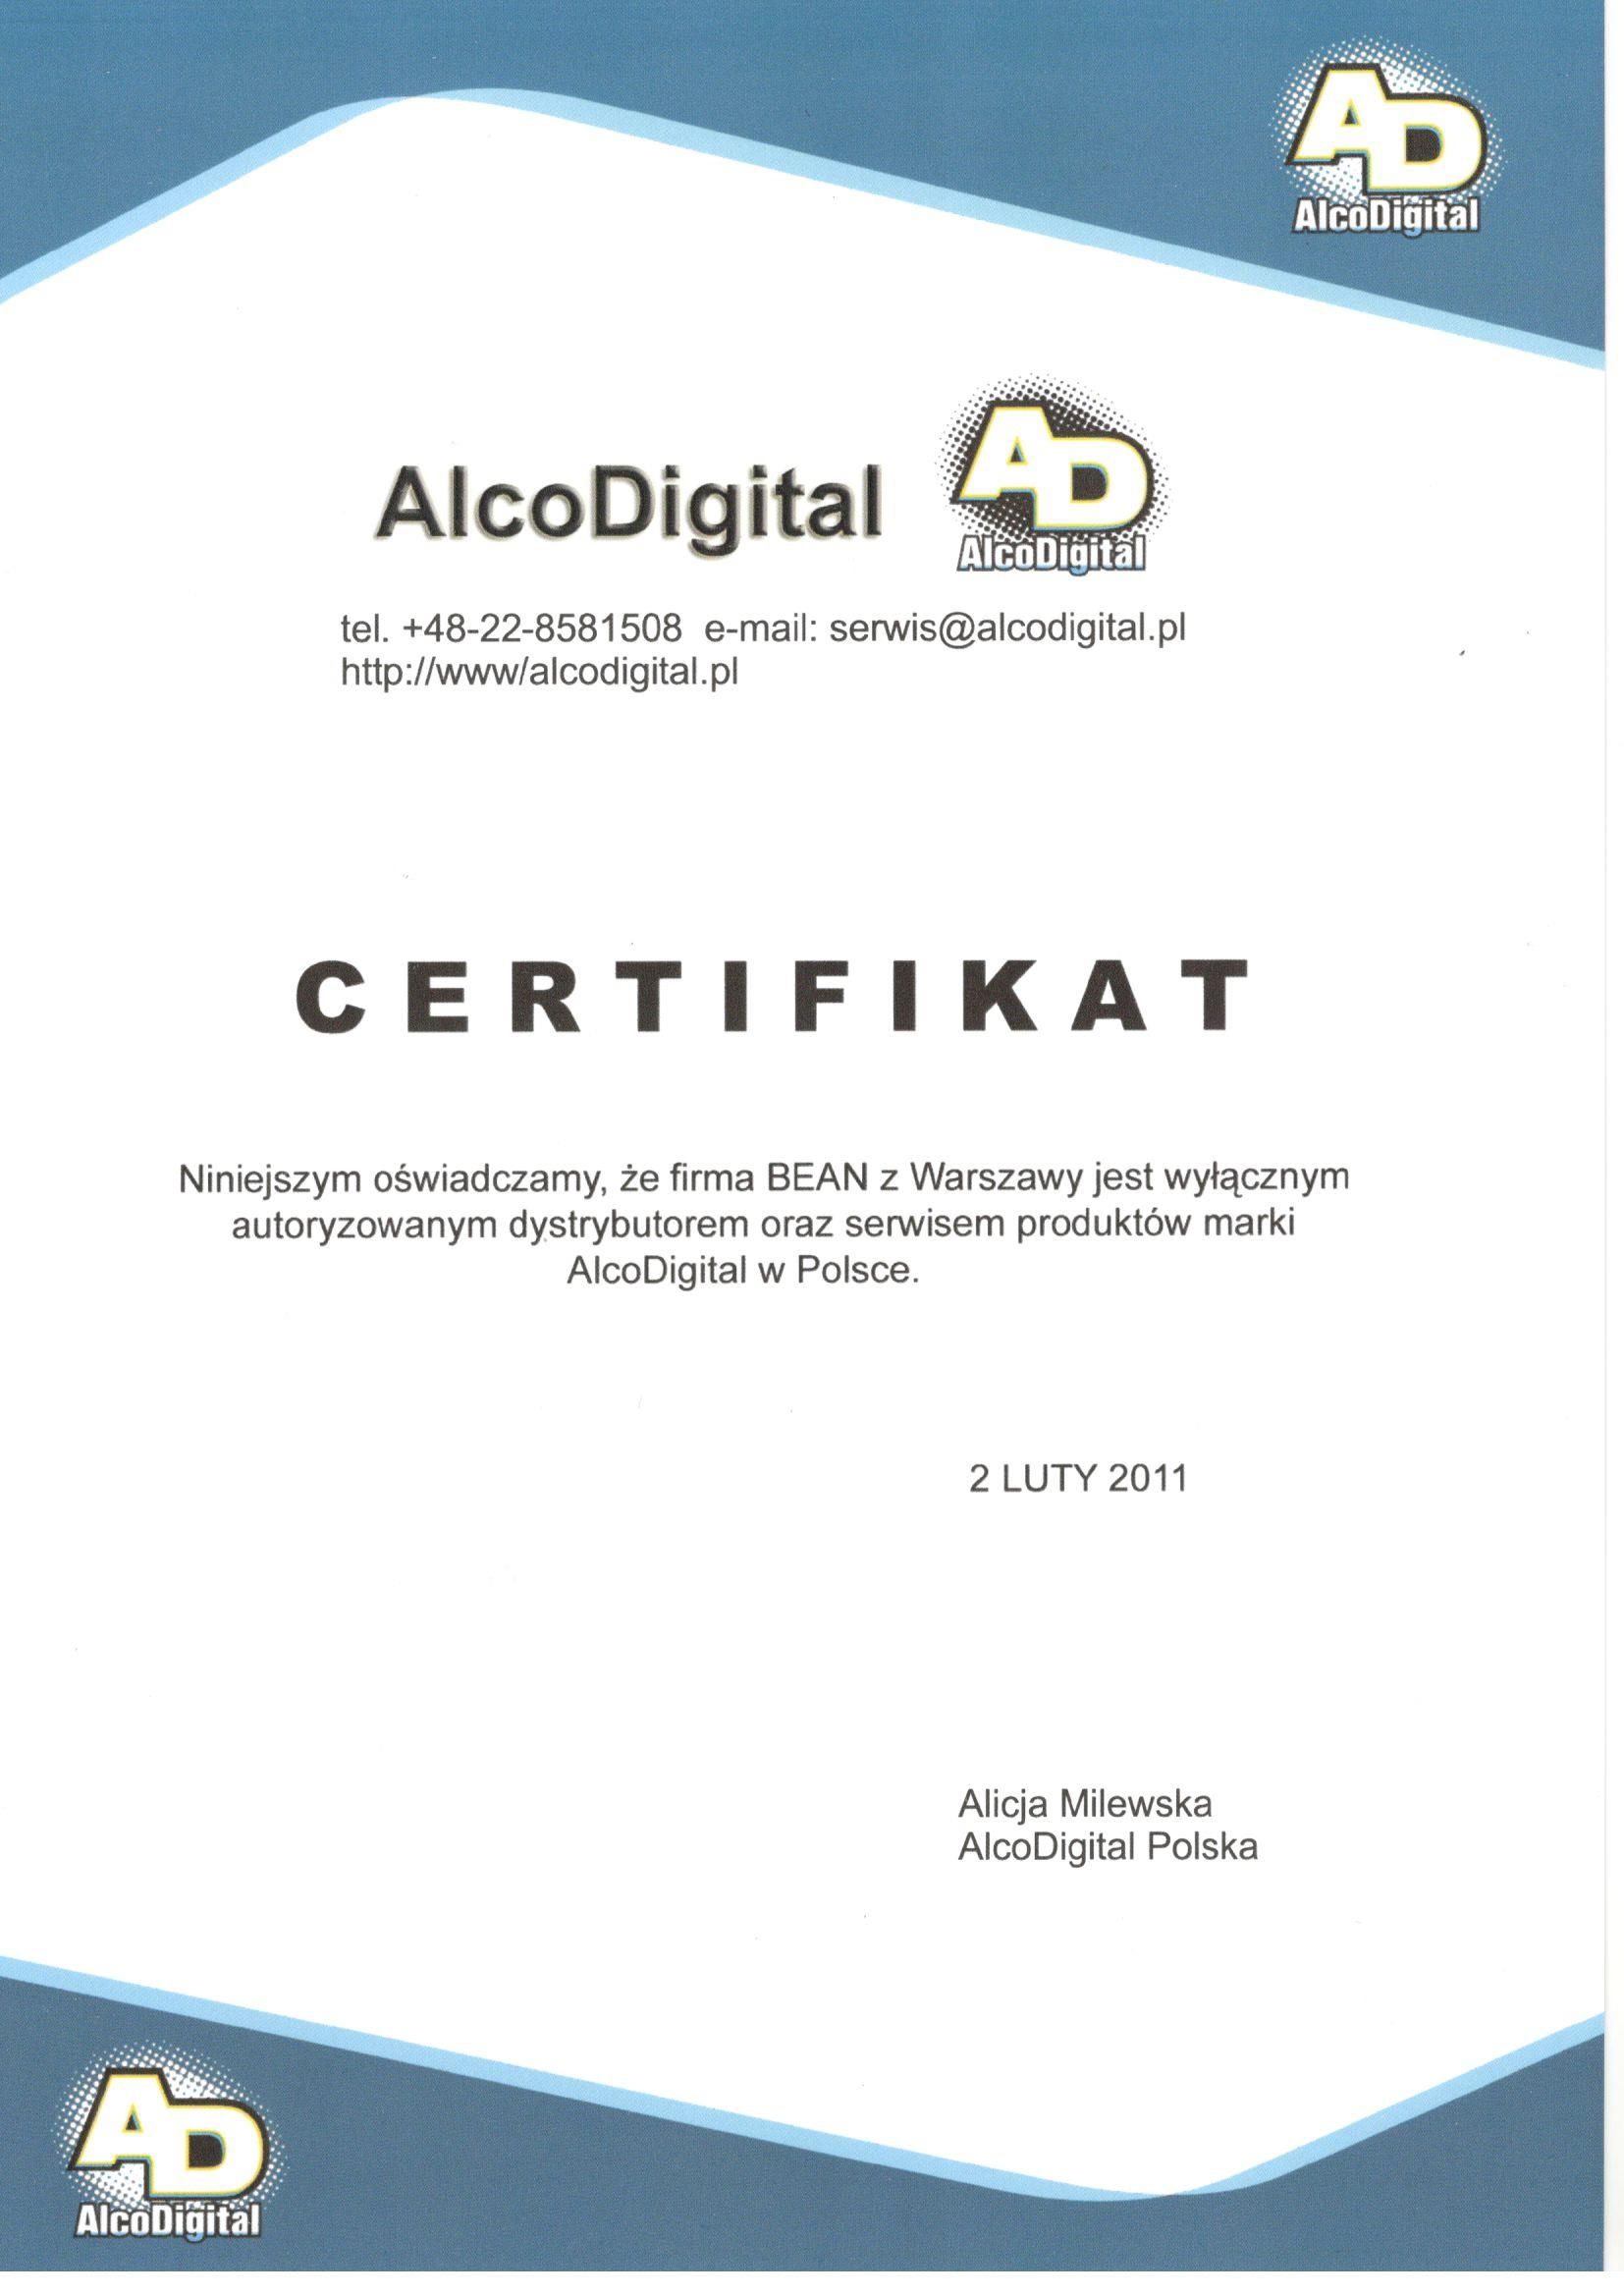 alcodigital.jpg